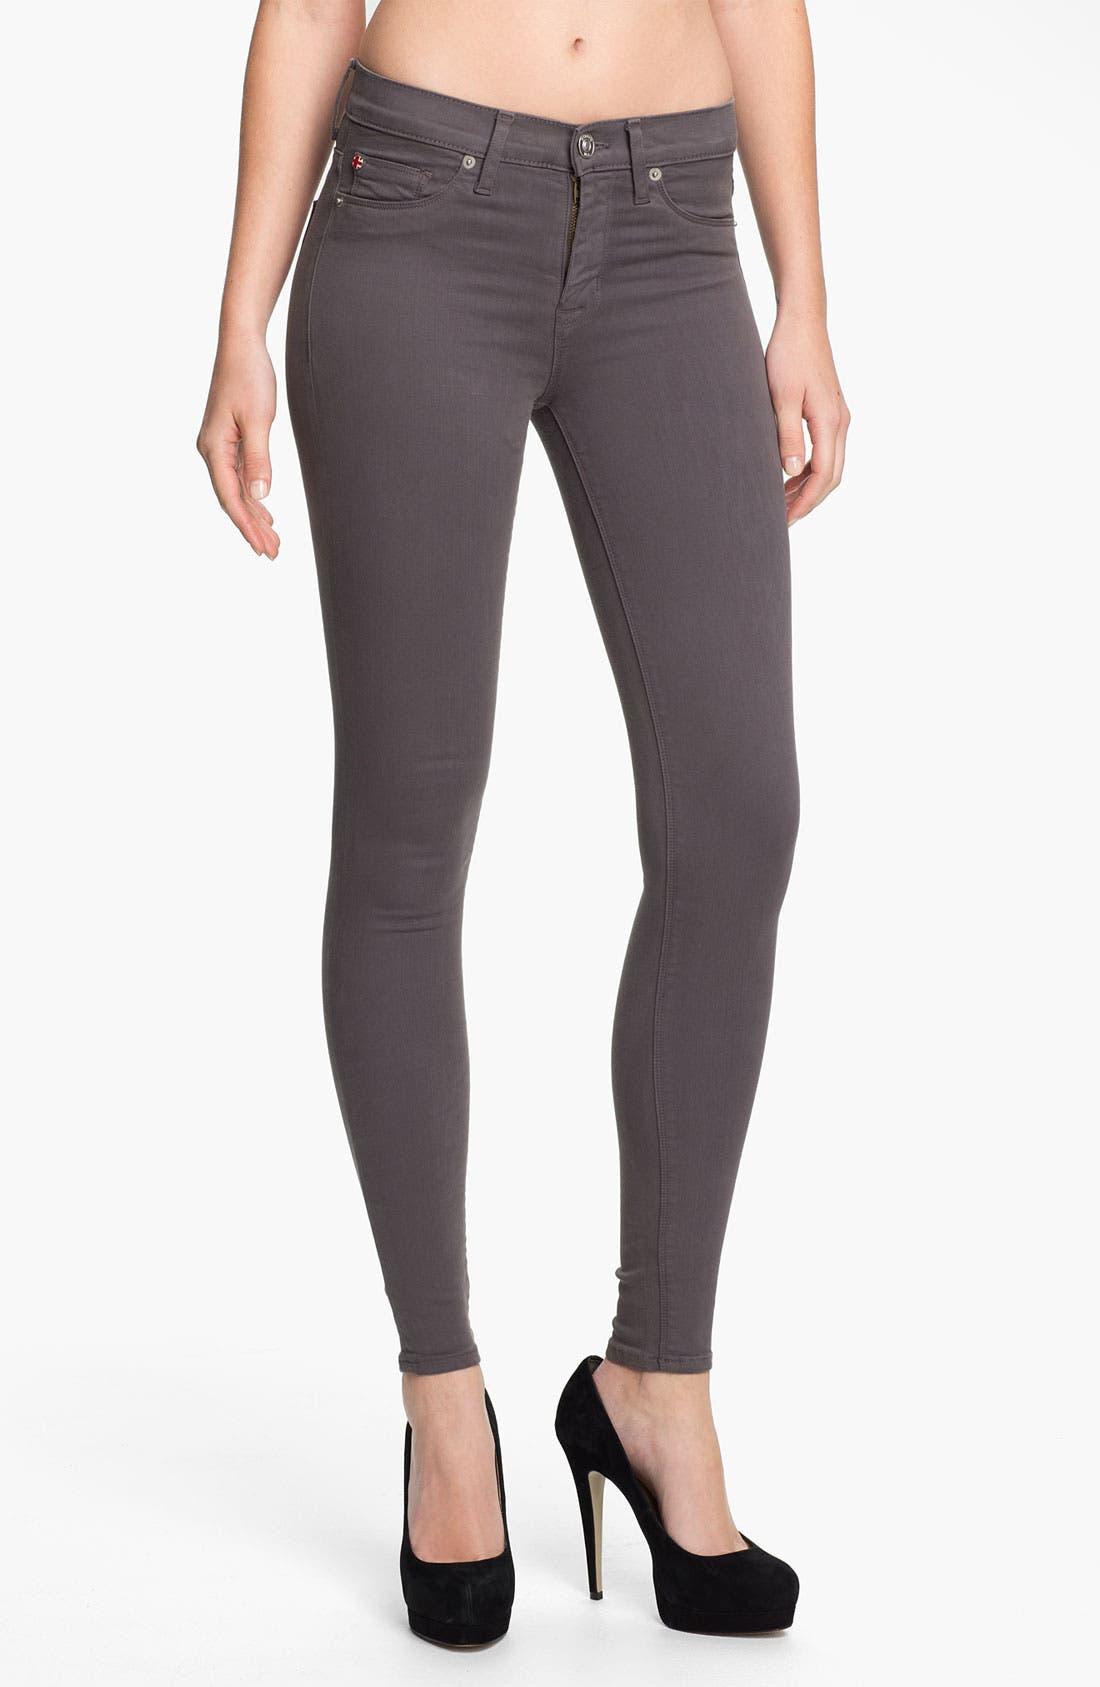 Alternate Image 1 Selected - Hudson Jeans 'Nico' Skinny Stretch Jeans (Dark Grey)